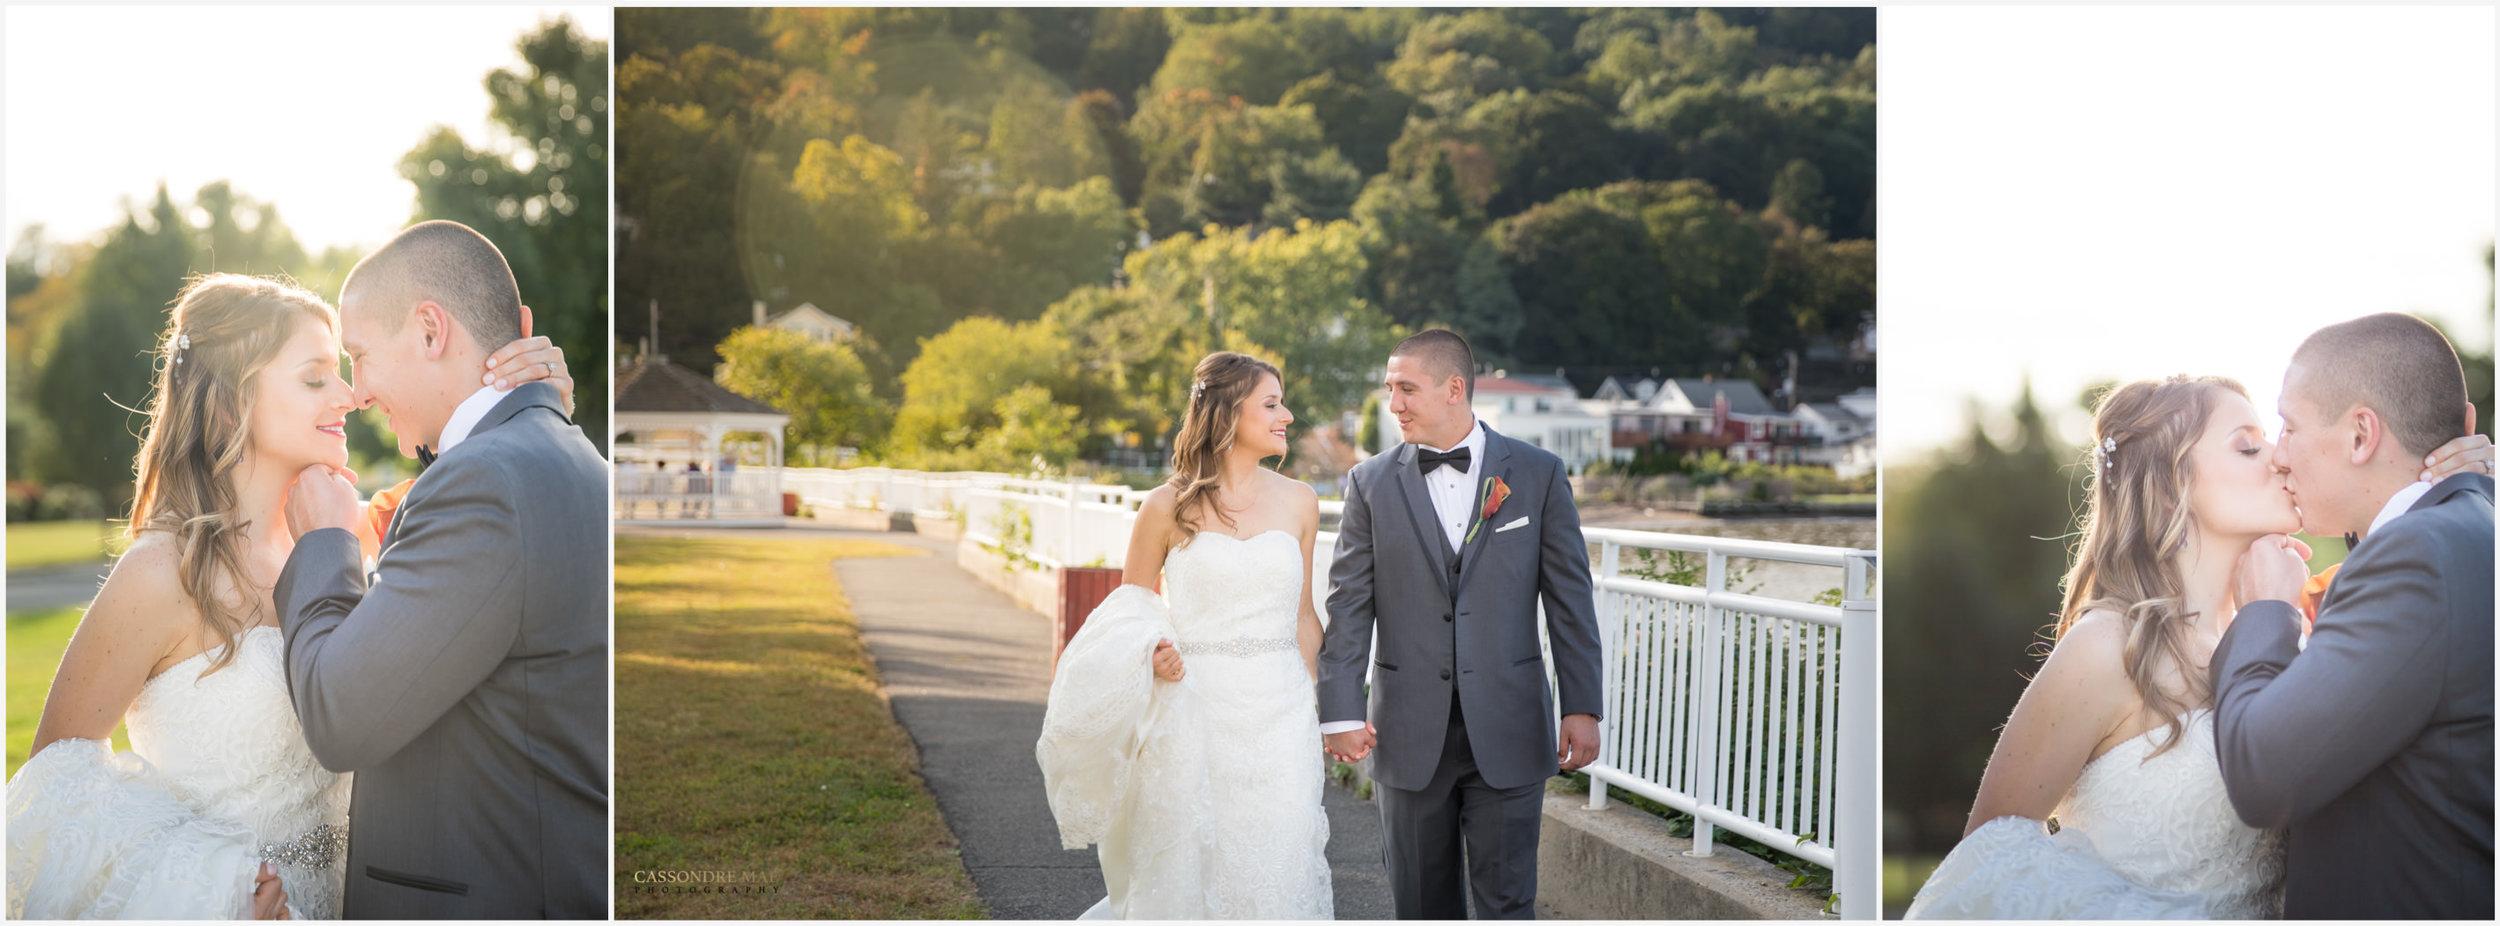 Views on the Hudson Wedding Photos Cassondre Mae Photography 6.jpg